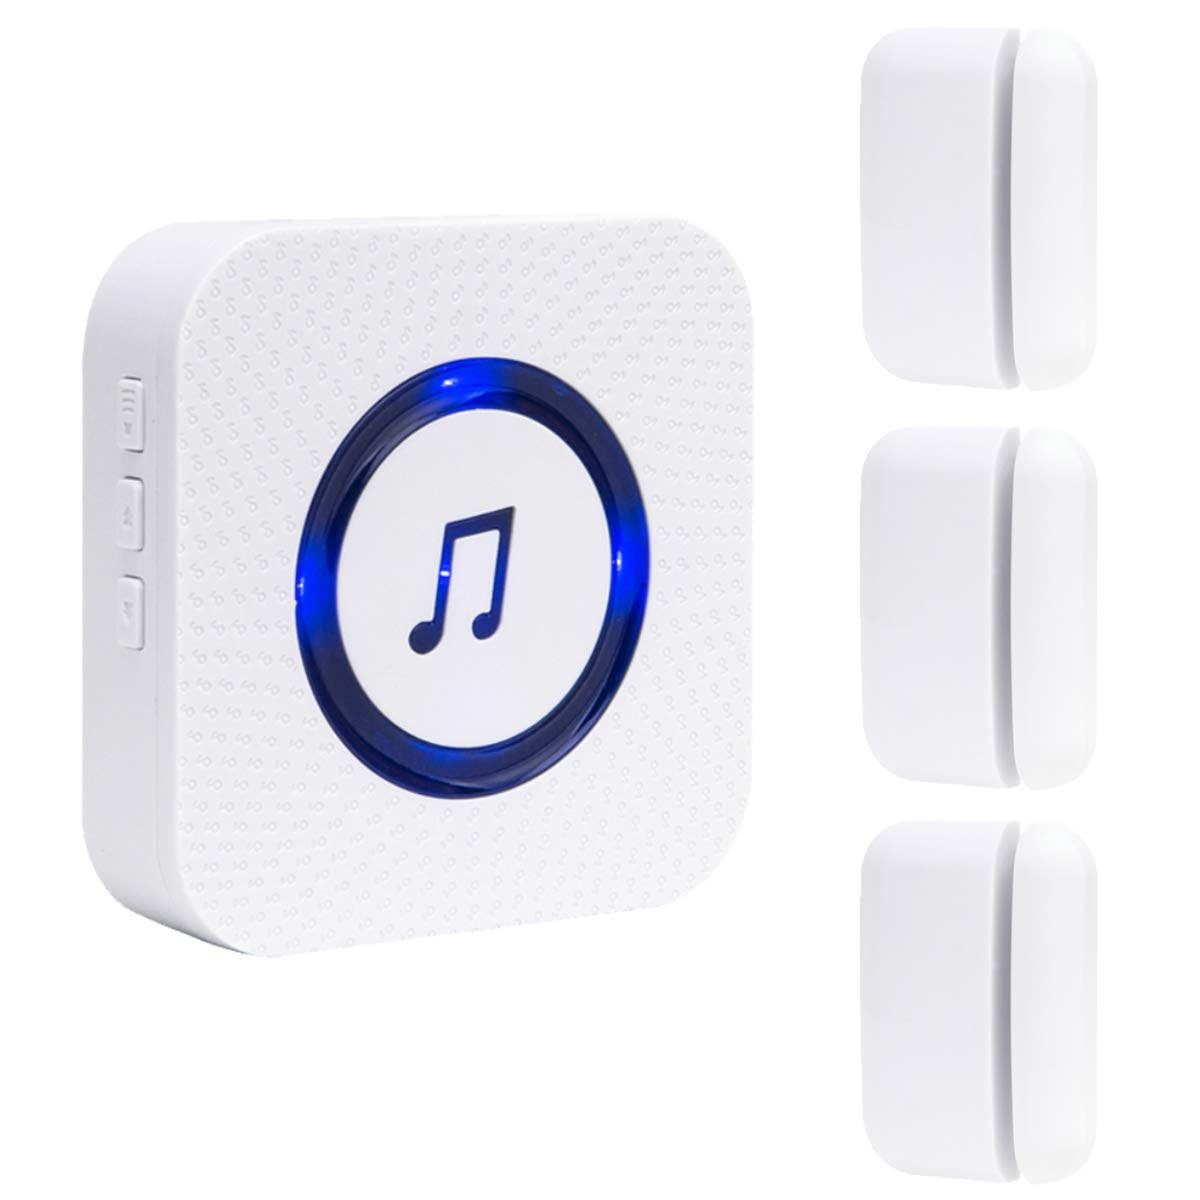 Wireless Door Open Chime Entrance Entry Alert Kit for Business Home Store 1 Receiver 3 Magnetic Door Window Sensor 52 Ringtones 4 Volume Level